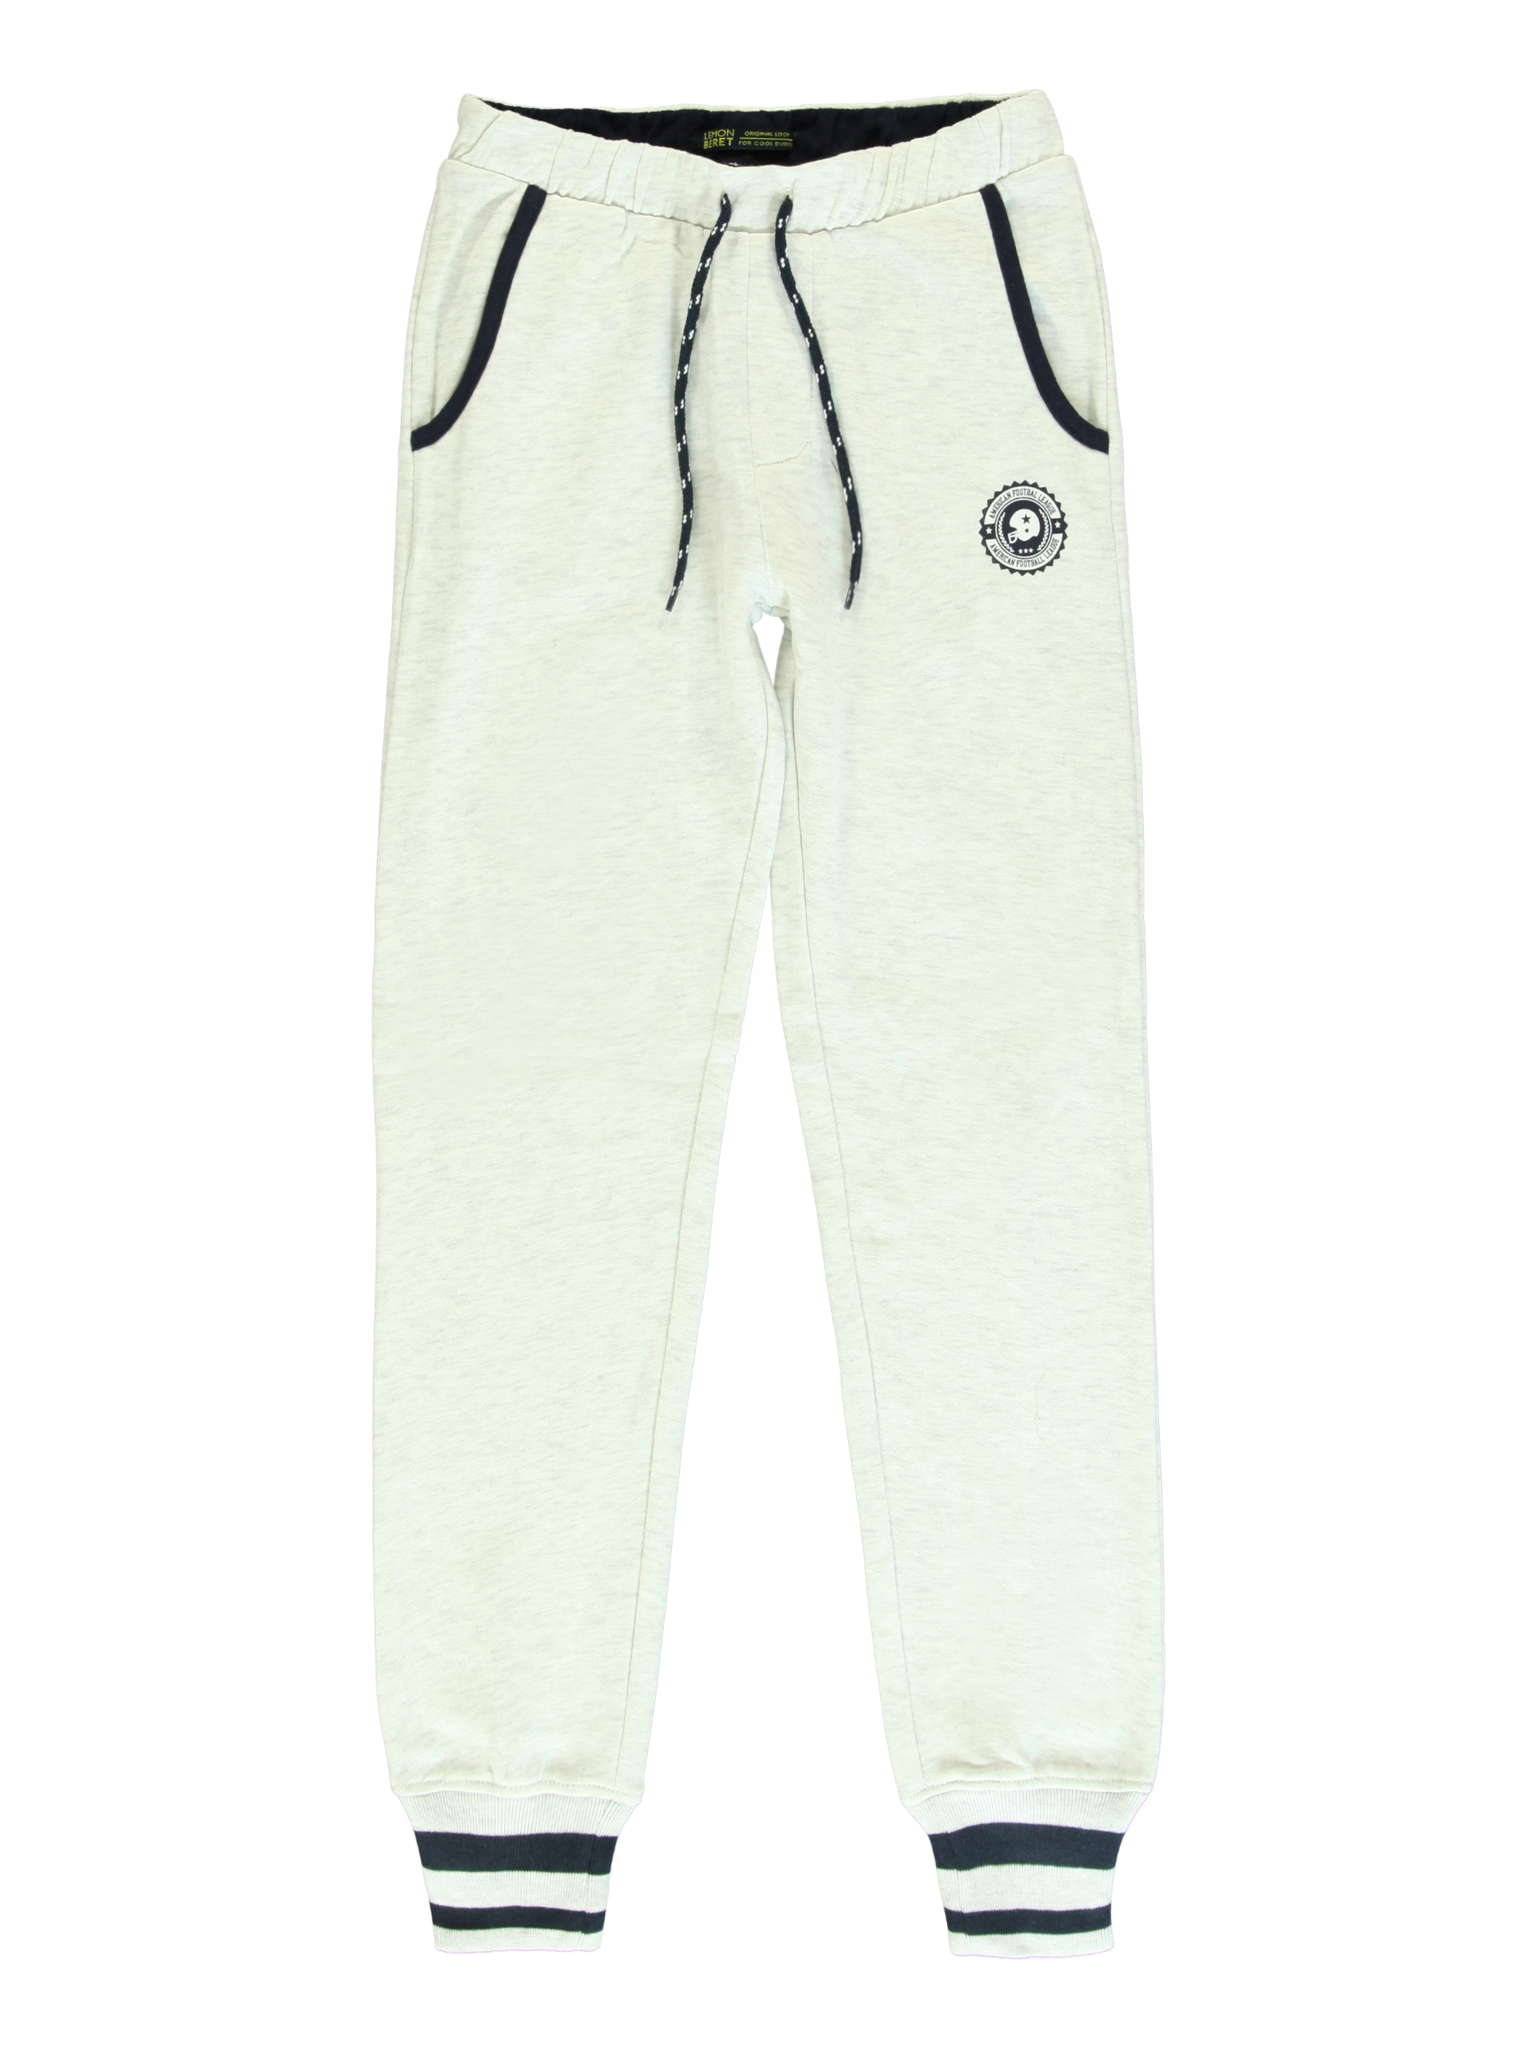 All Brands | Summerproducts Teen Boys | Jogging Pant | 10 pcs/box